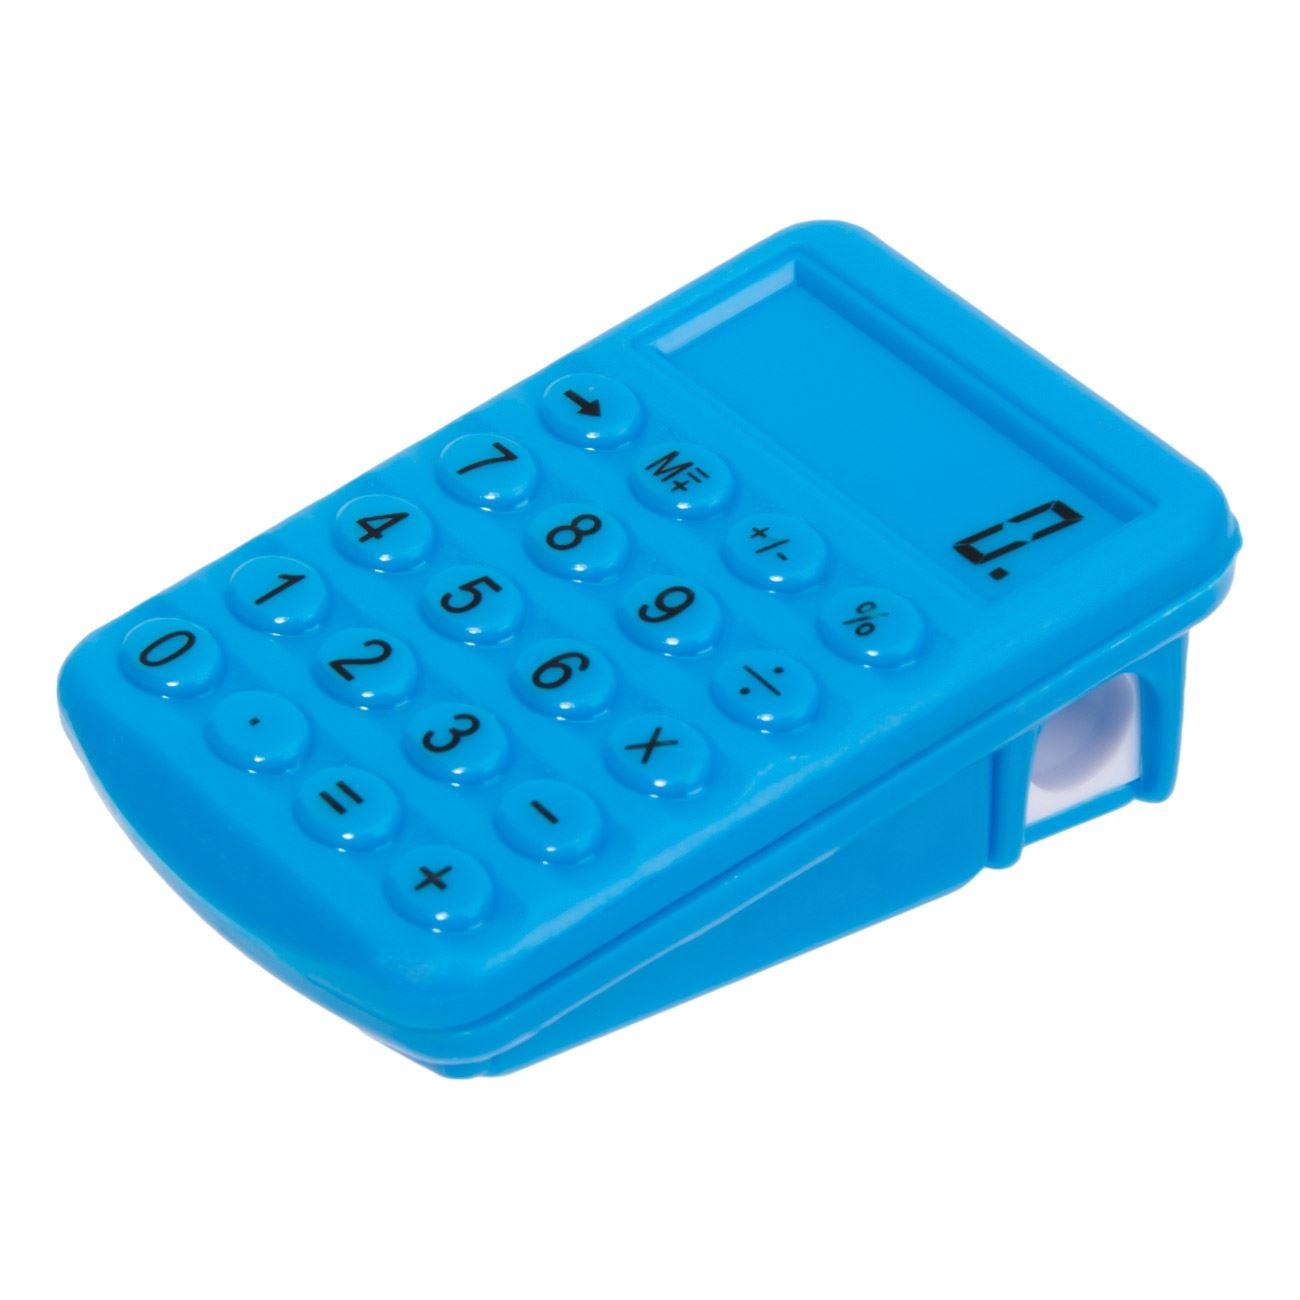 70a5f3d151 Ξύστρα Μονή Πλαστική Κομπιουτεράκι Μπλε 6 εκ.   Ξύστρες Διάφορα Σχέδια